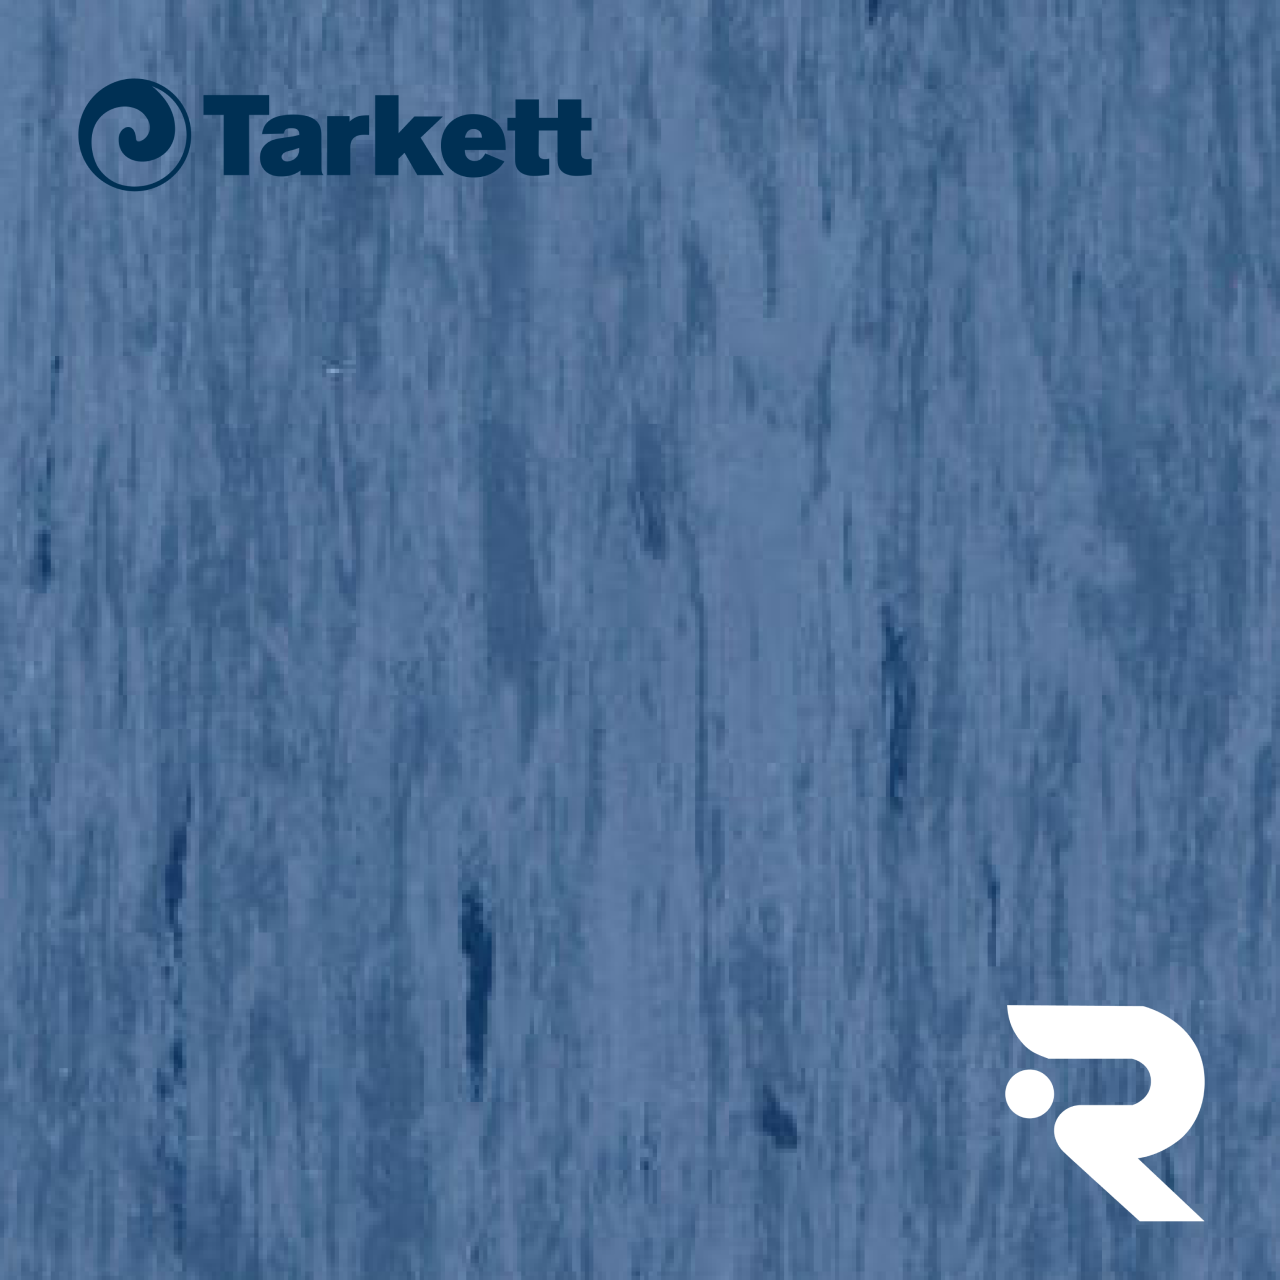 🏫 Гомогенный линолеум Tarkett | Standard DARK BLUE 0493 | Standard Plus 2.0 mm | 610 х 610 мм